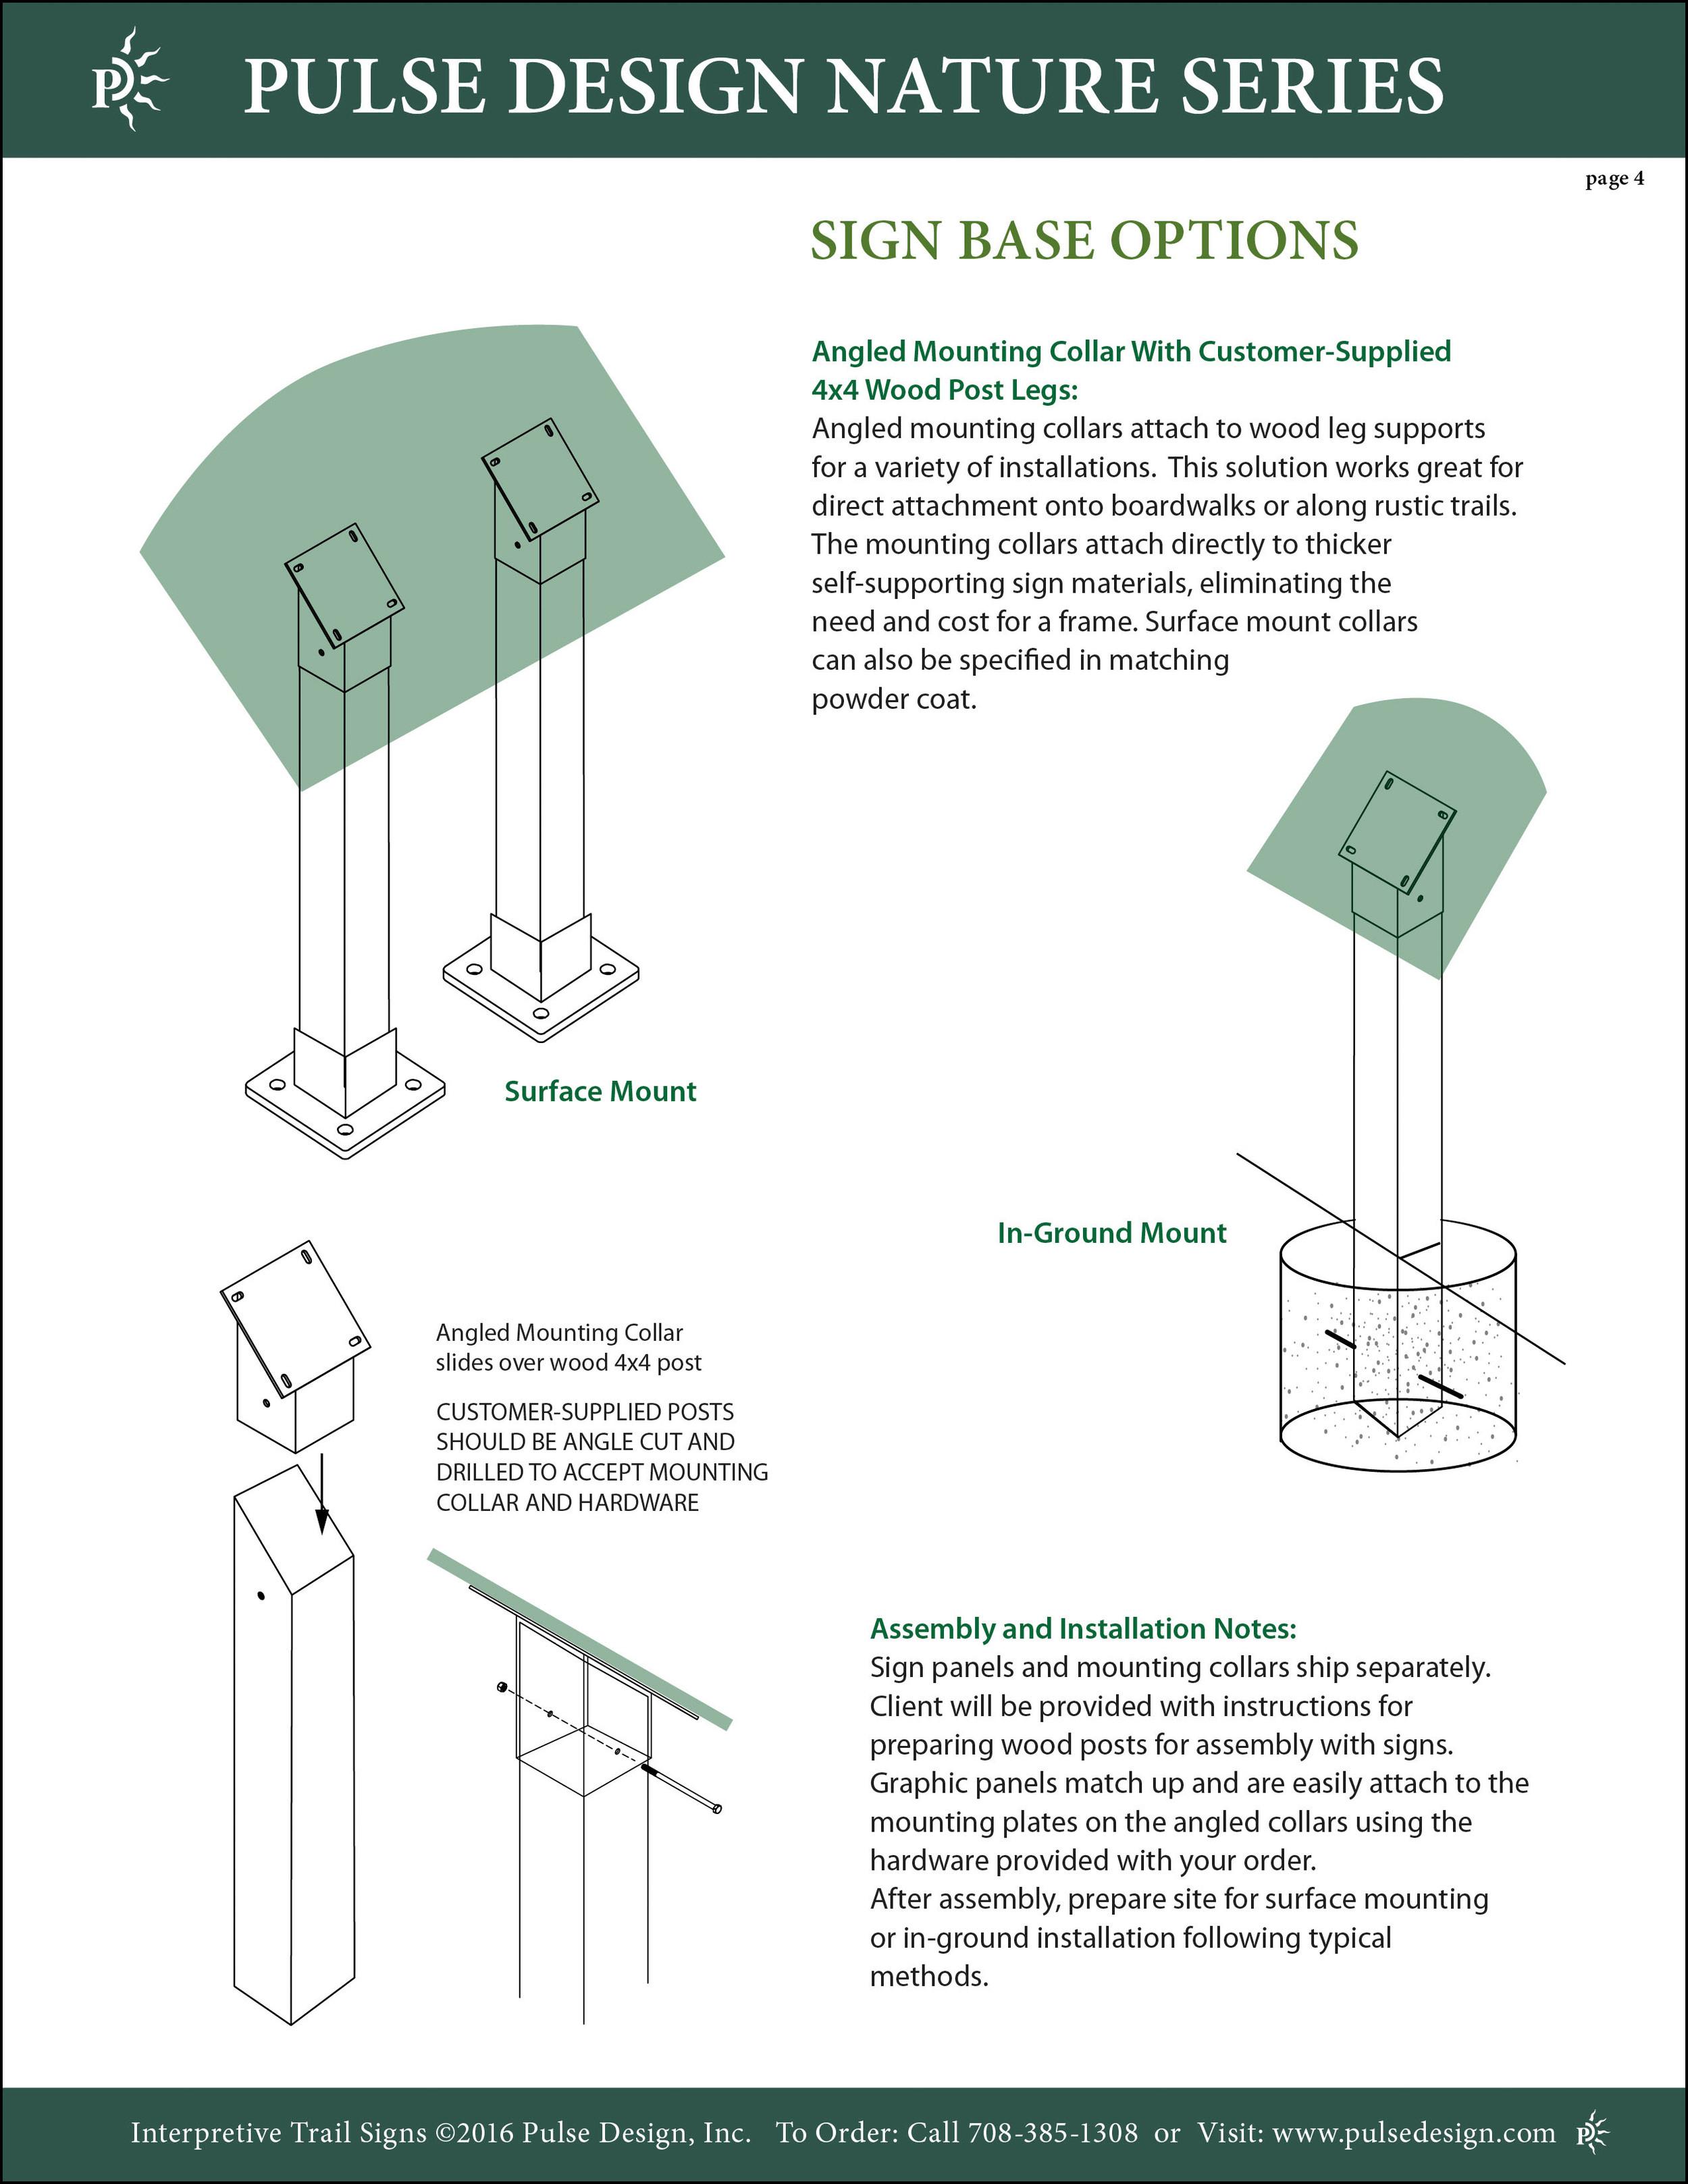 PULSE-DESIGN-NATURE-SERIES-SIGN-BASE-OPTIONS-4.jpg